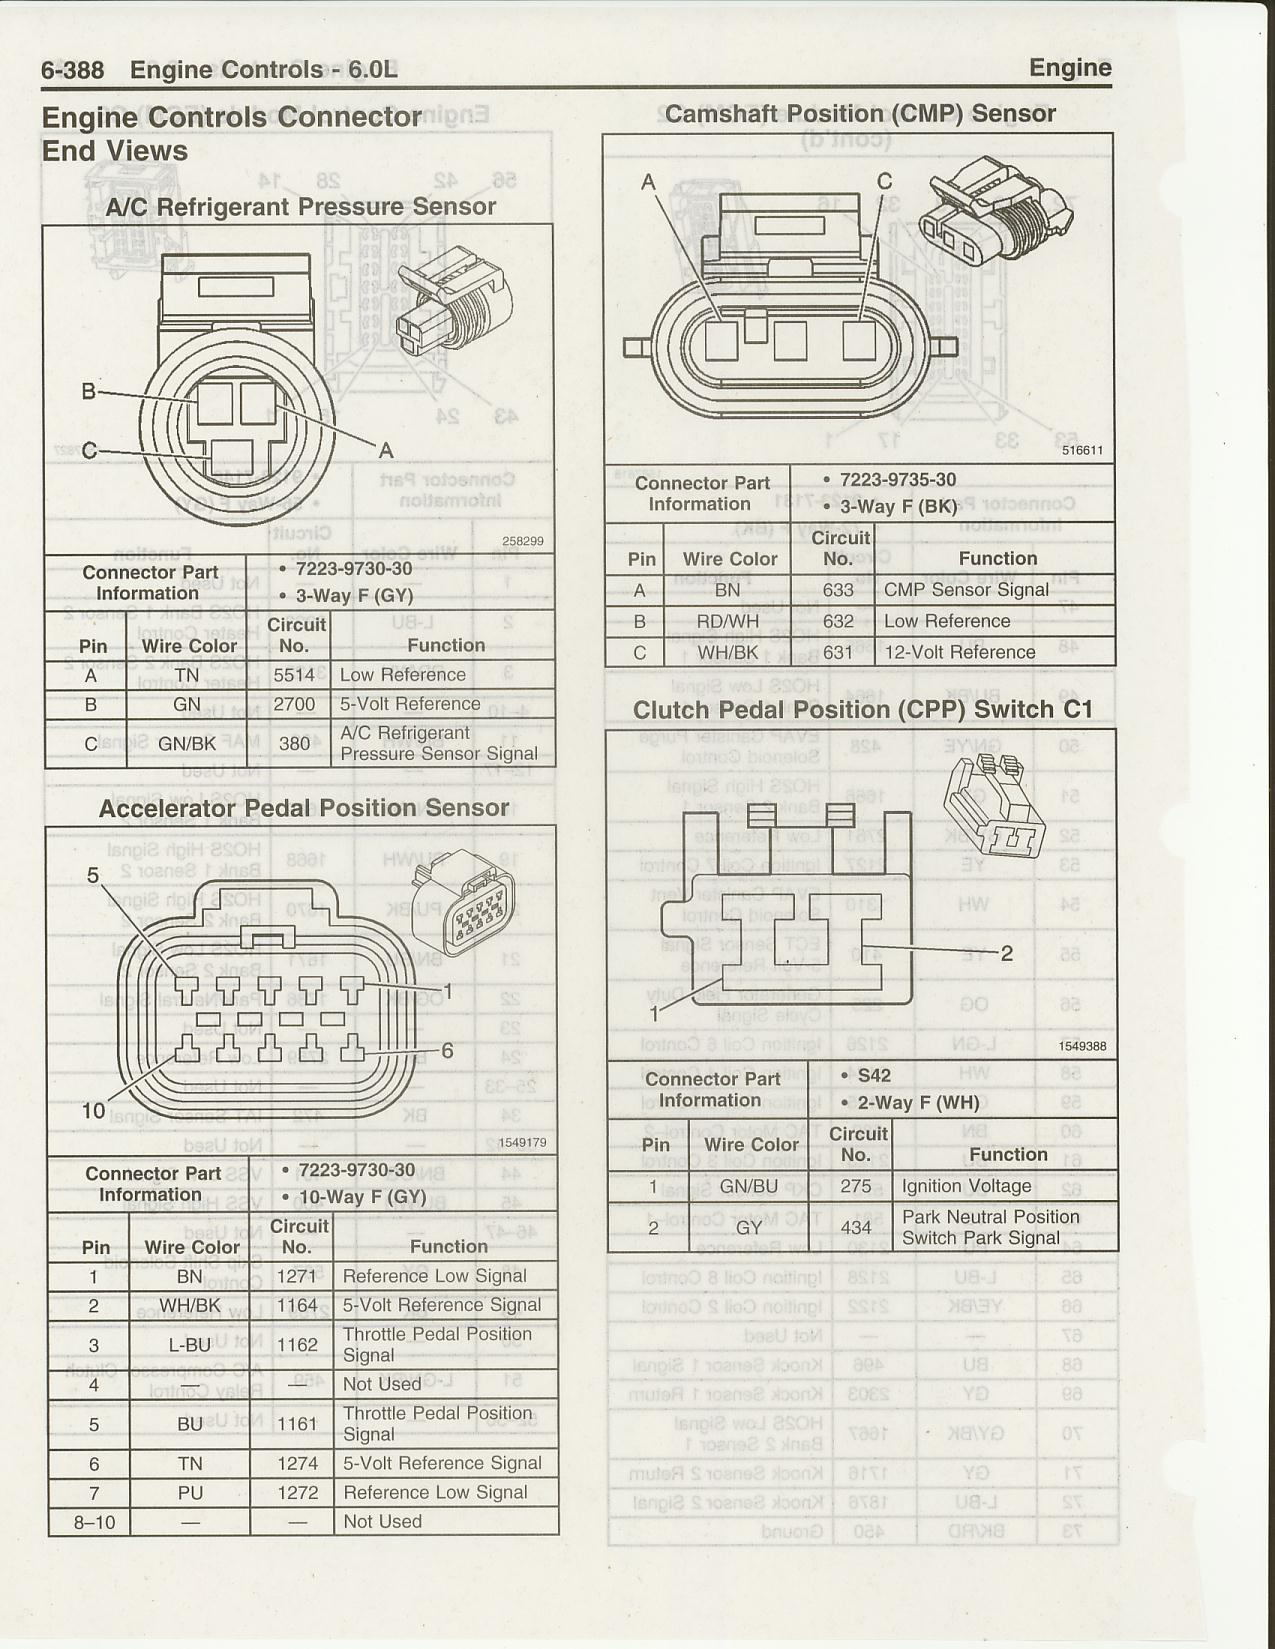 hight resolution of 2006 gto map iat wiring diagram wiring library rh 26 evitta de 1964 gto dash wiring diagram 1964 gto dash wiring diagram